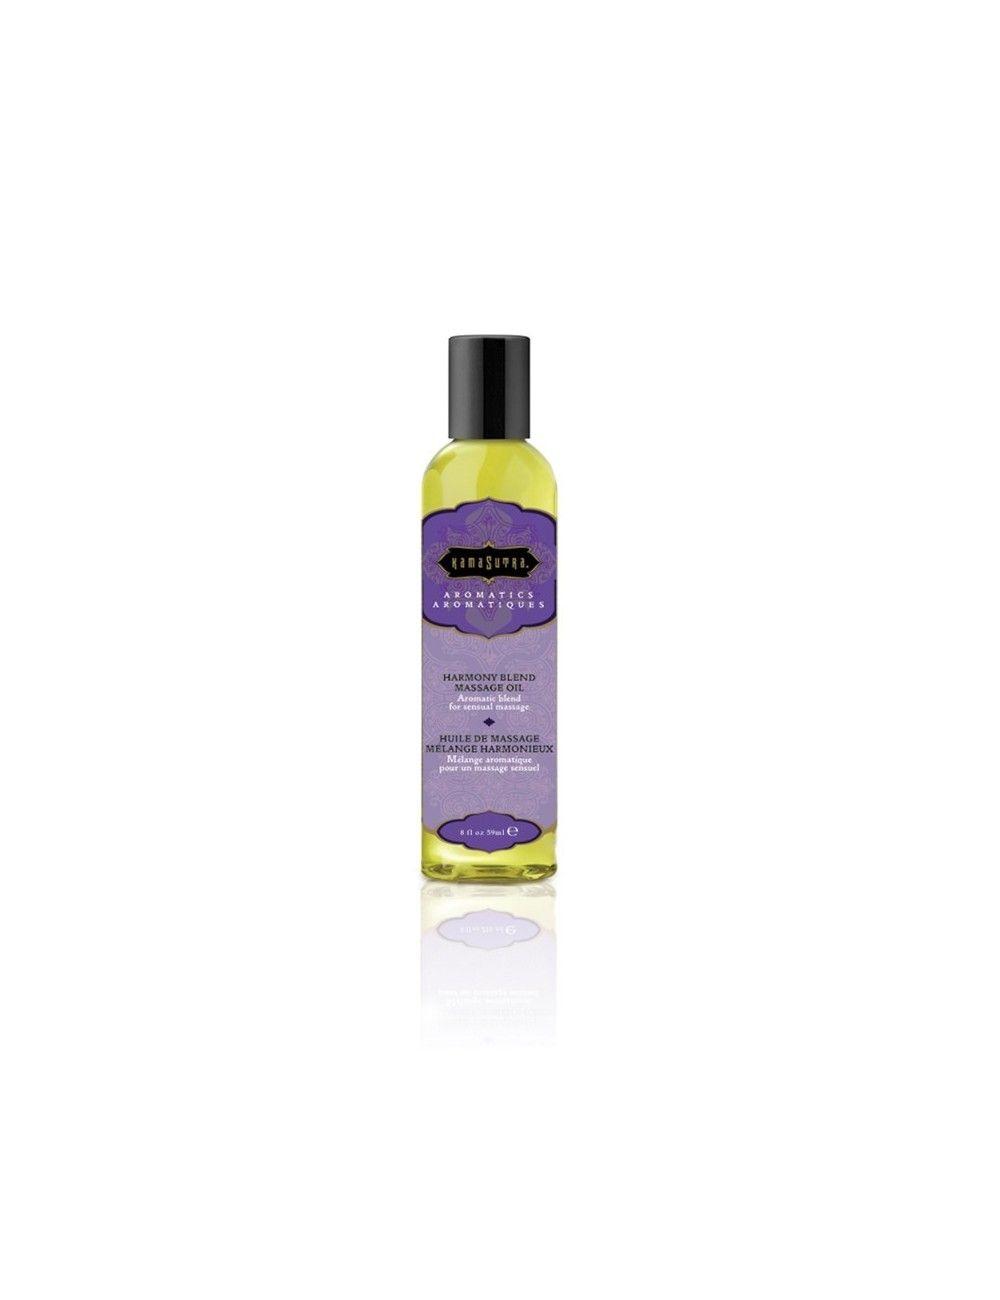 Huile aromatic massage 59ml Harmonie KAMASUTRA